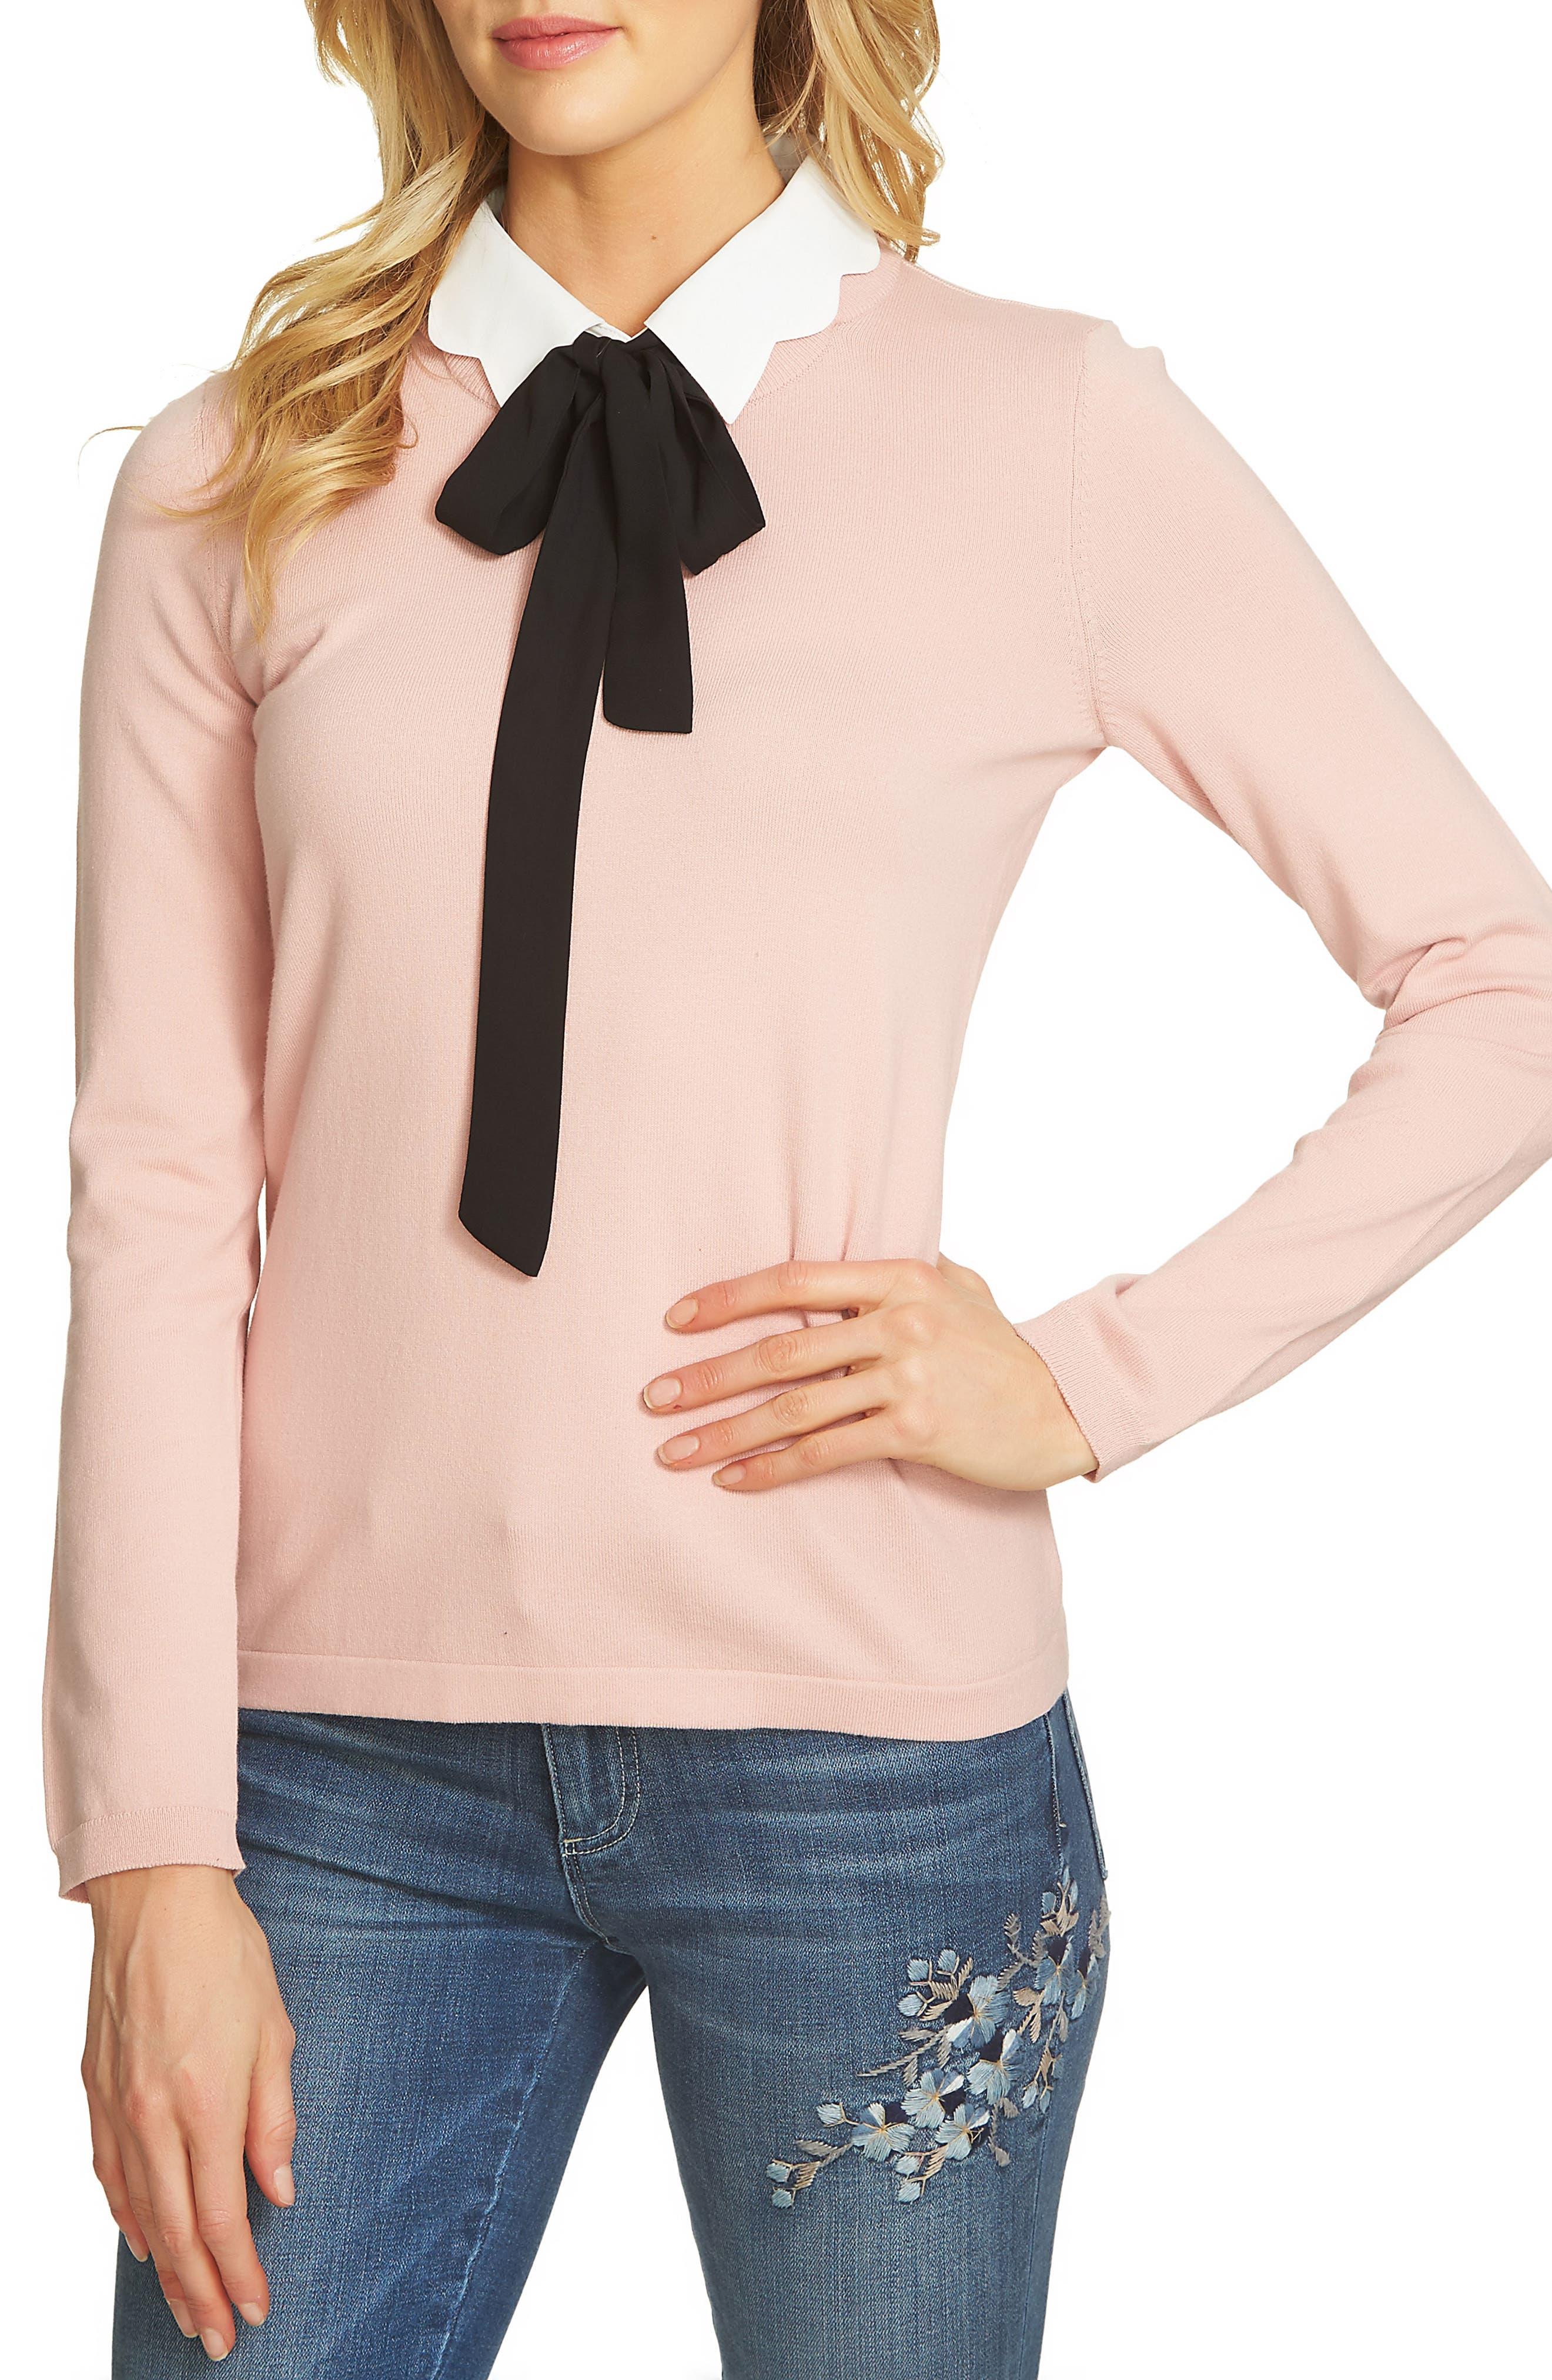 Main Image - CeCe Scalloped Tie Collar Sweater